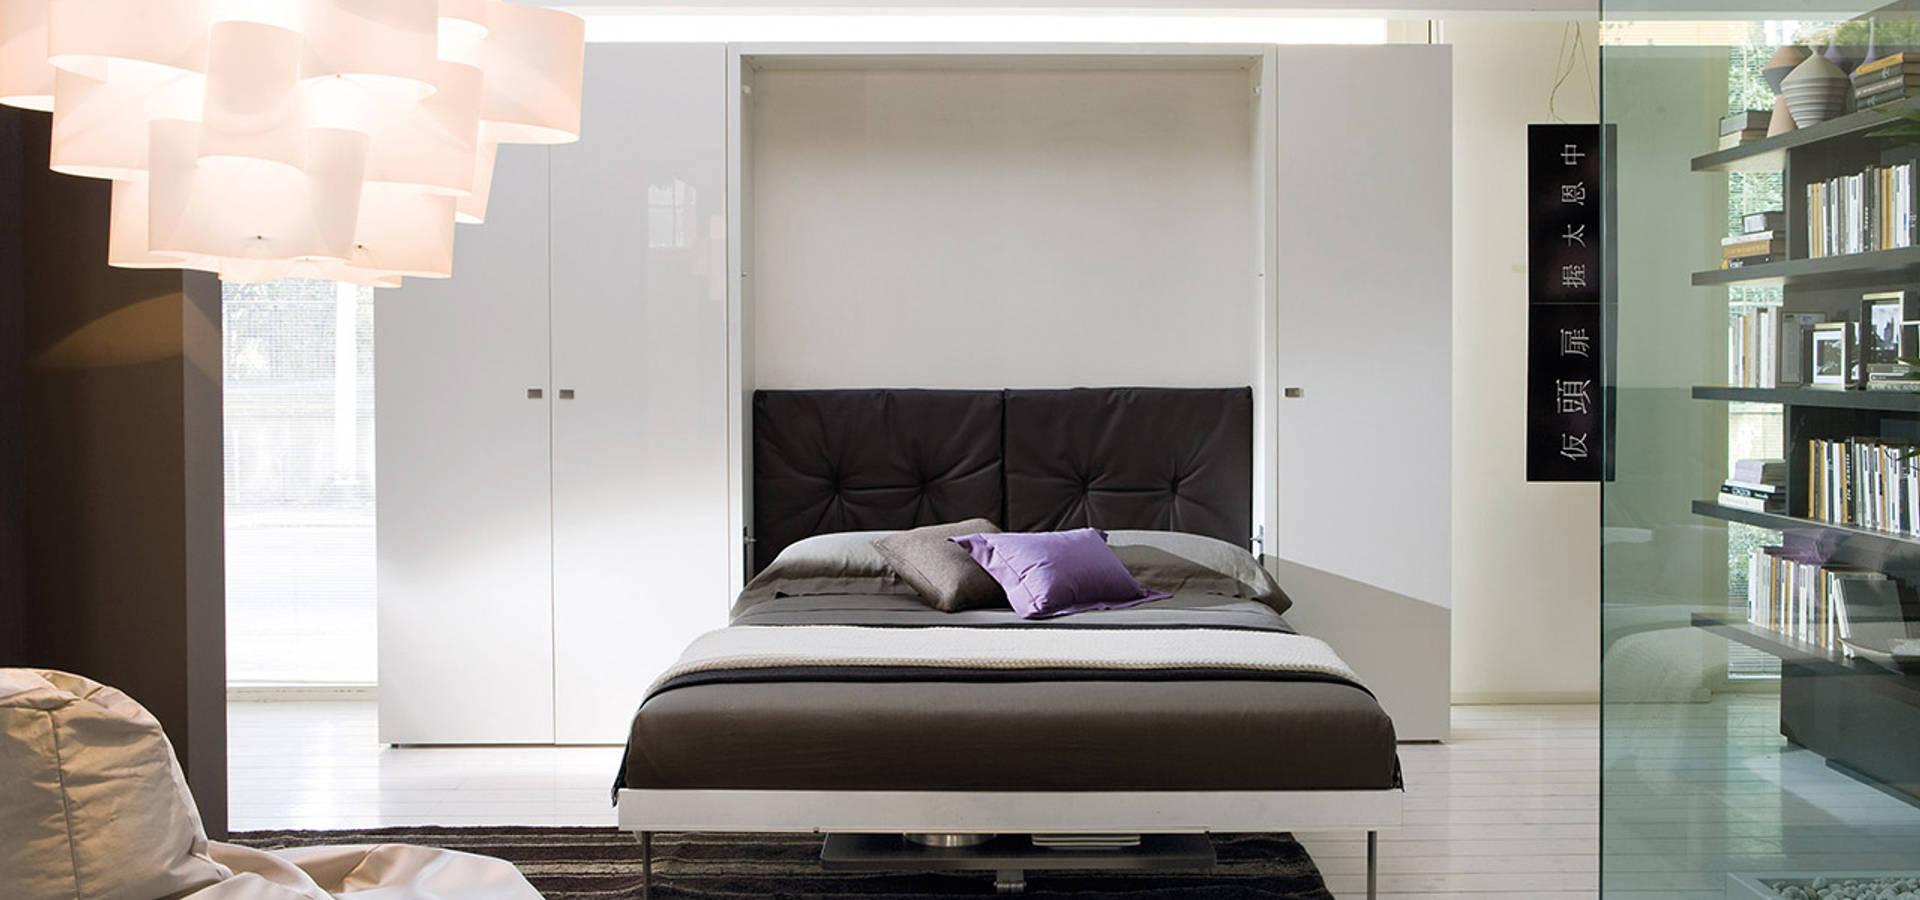 schrankbetten by homify. Black Bedroom Furniture Sets. Home Design Ideas